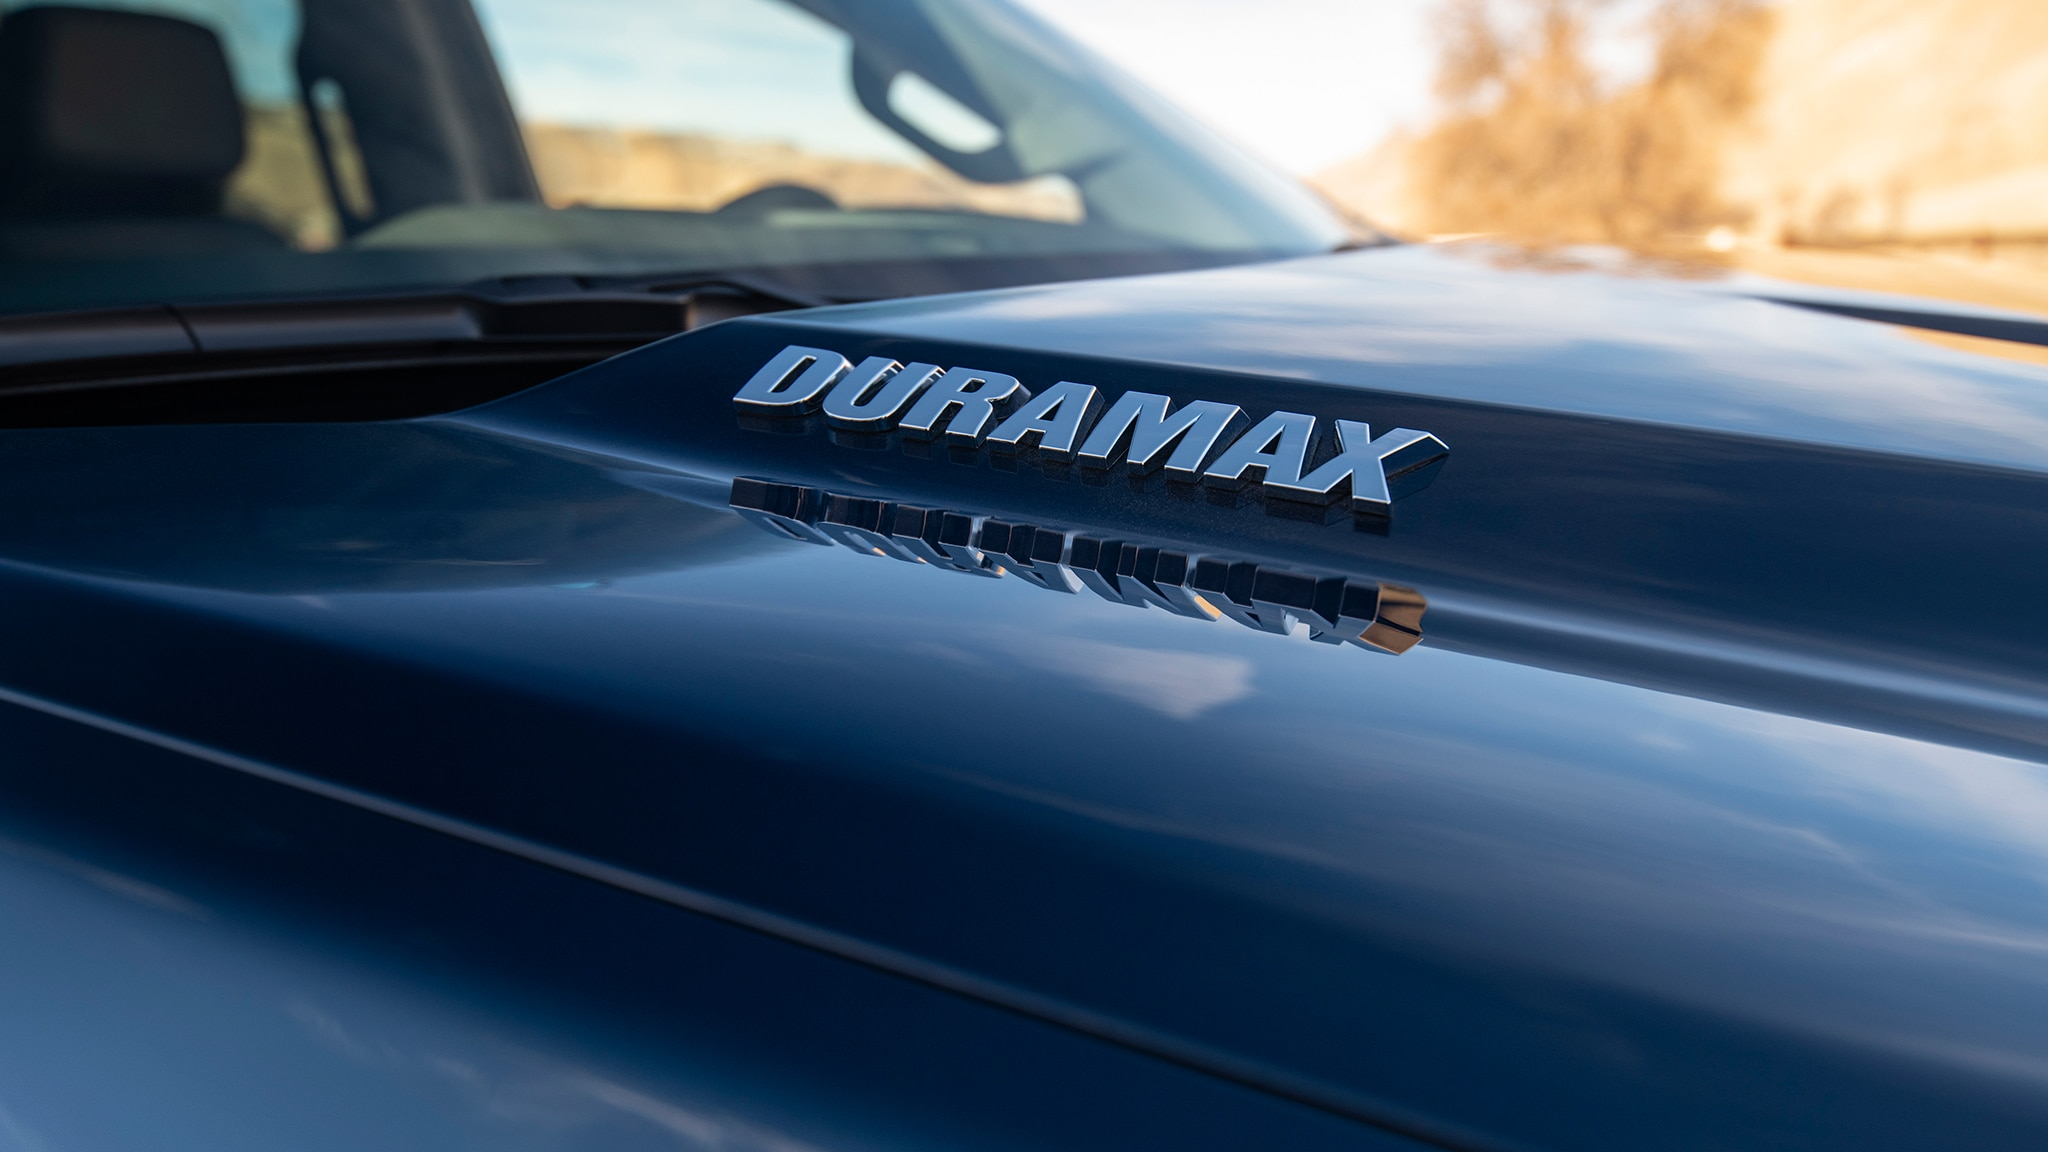 2020 Chevrolet Silverado 1500 Diesel First Drive Review | Automobile